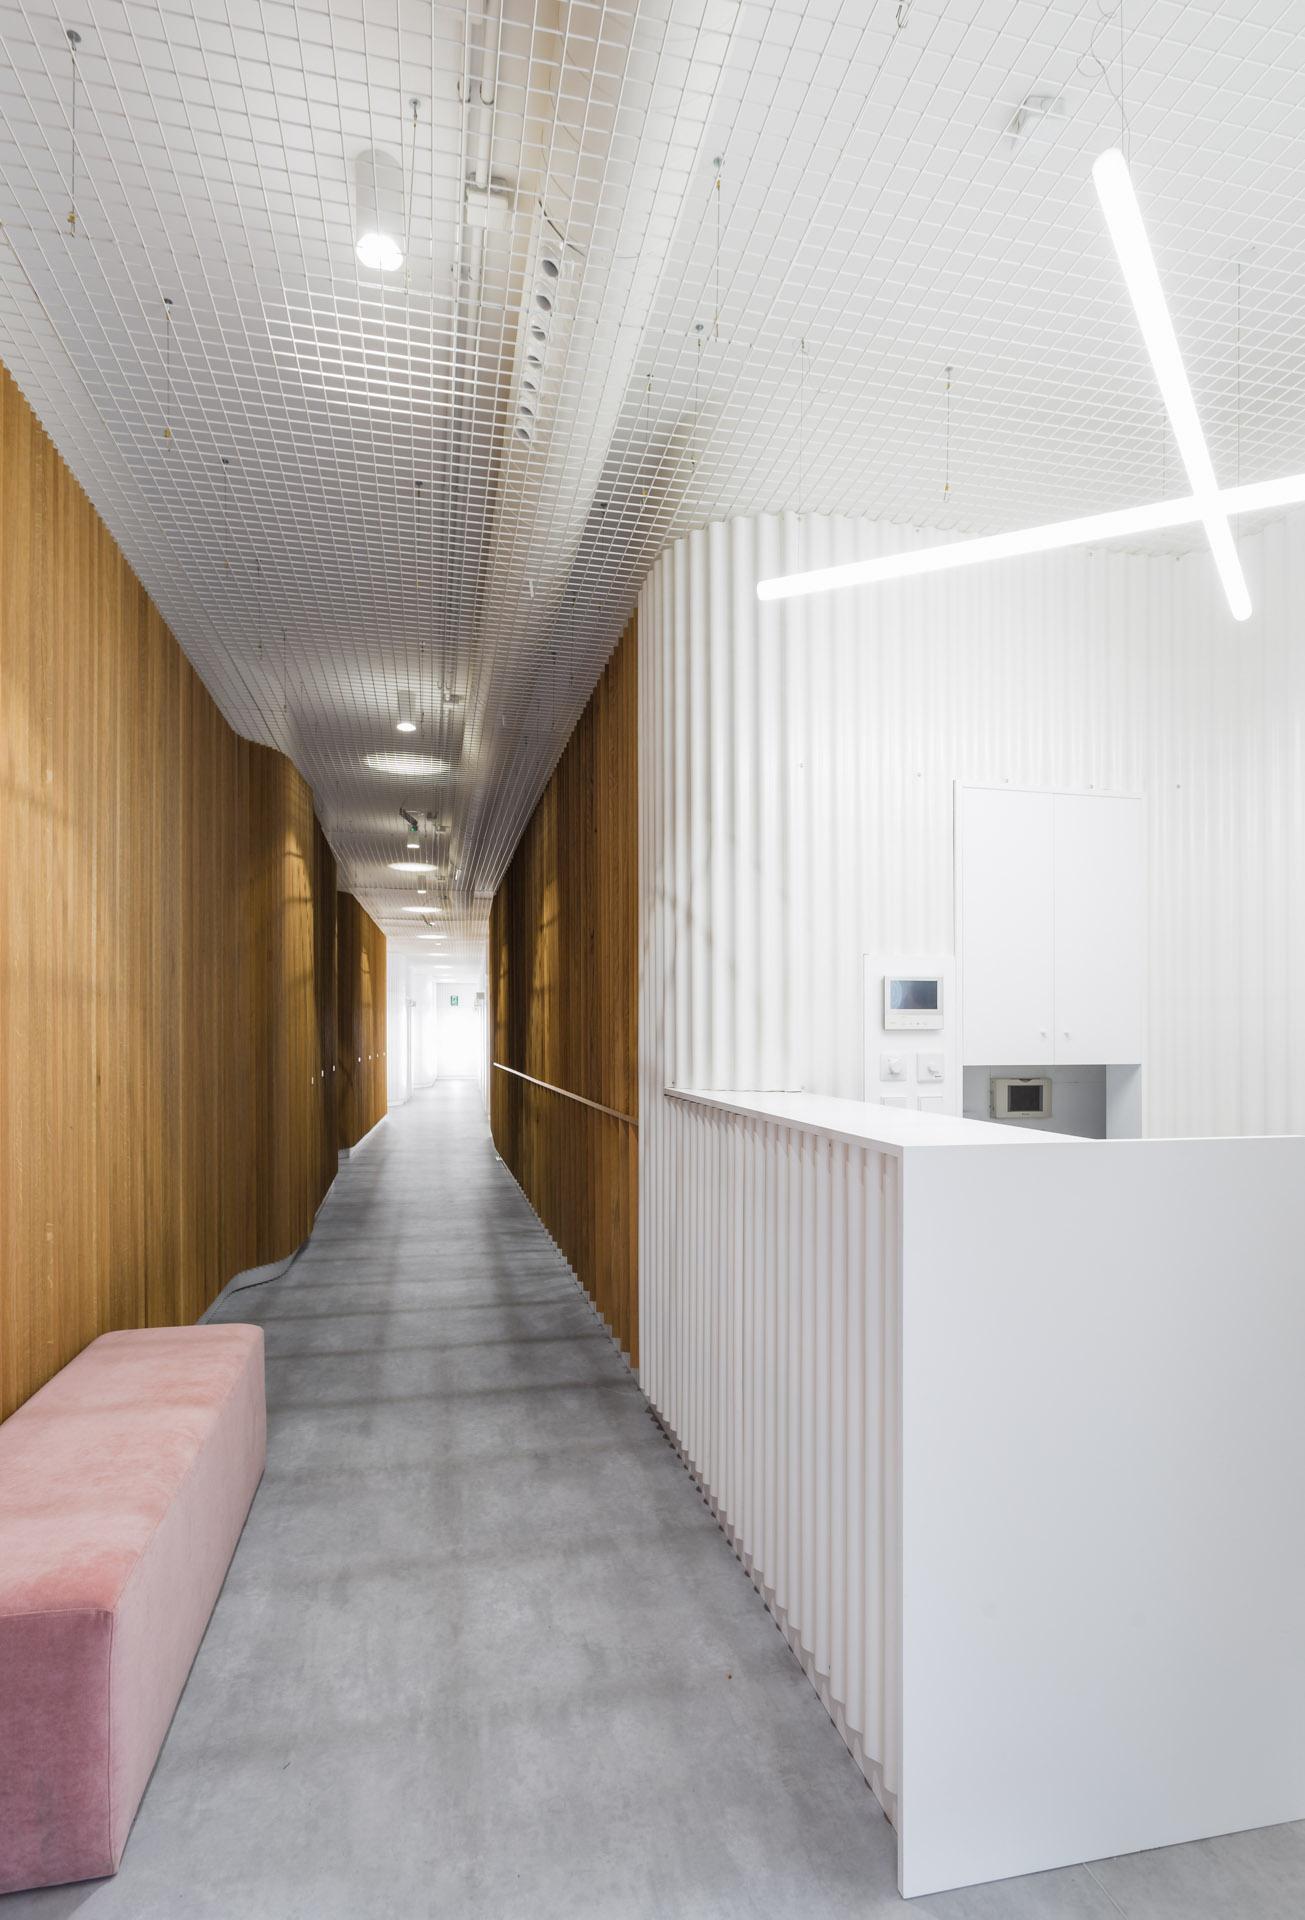 Alter Saúde | Otravueltadetuerca Arquitectura - Alter Saúde | Otravueltadetuerca Arquitectura | Jose Chas